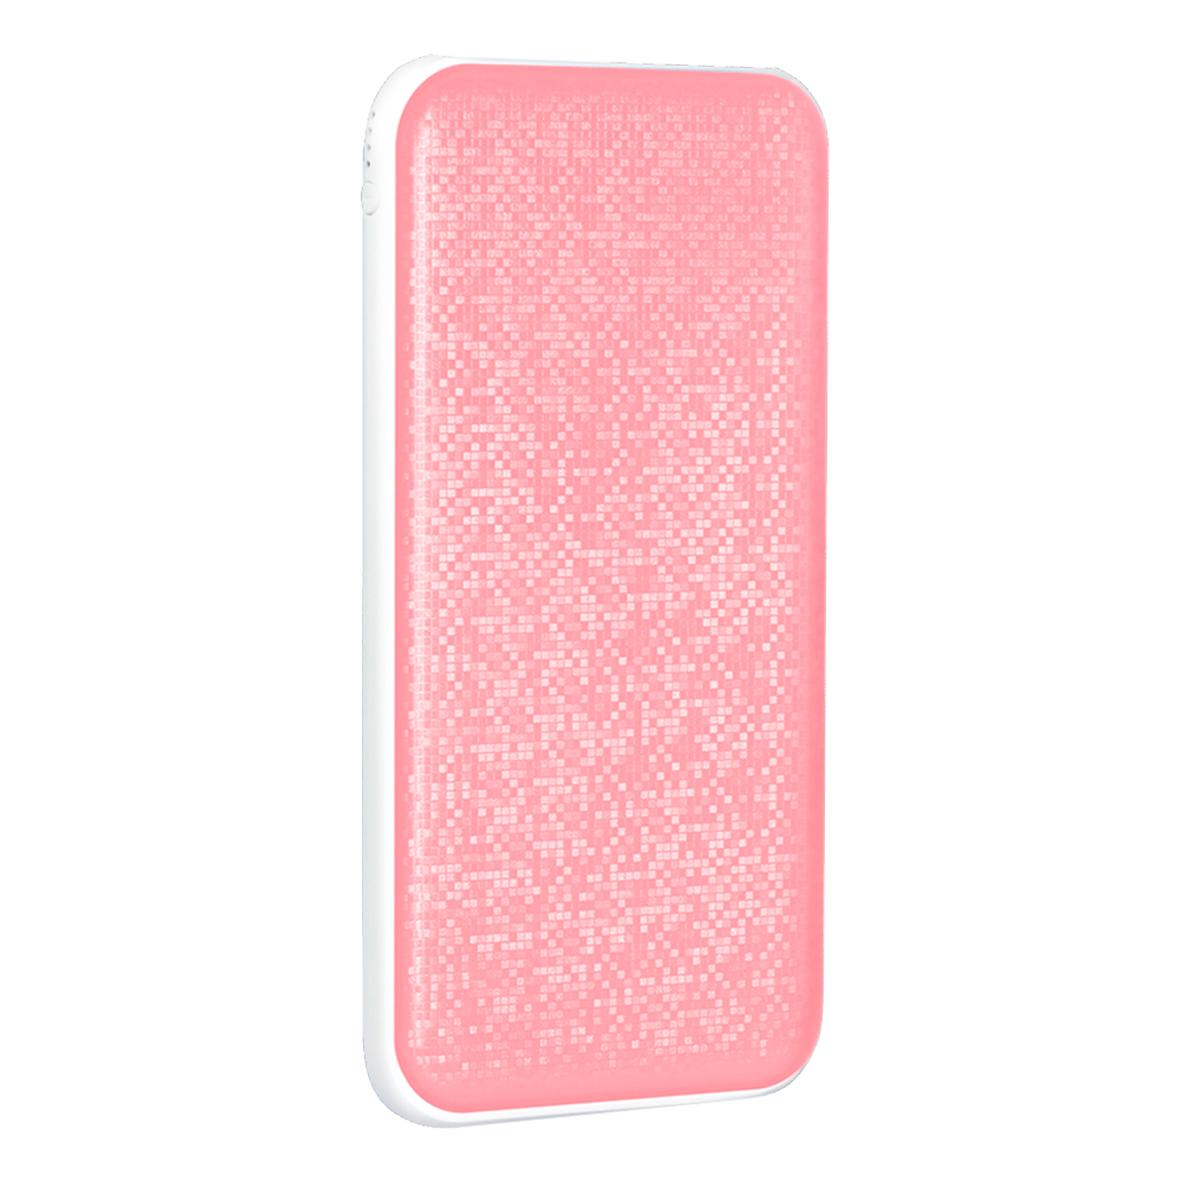 Nobby Pixel 030-001, Pink внешний аккумулятор (10 000 мАч) аккумулятор nobby slim 025 001 4000 mah usb 1 2а black 09282